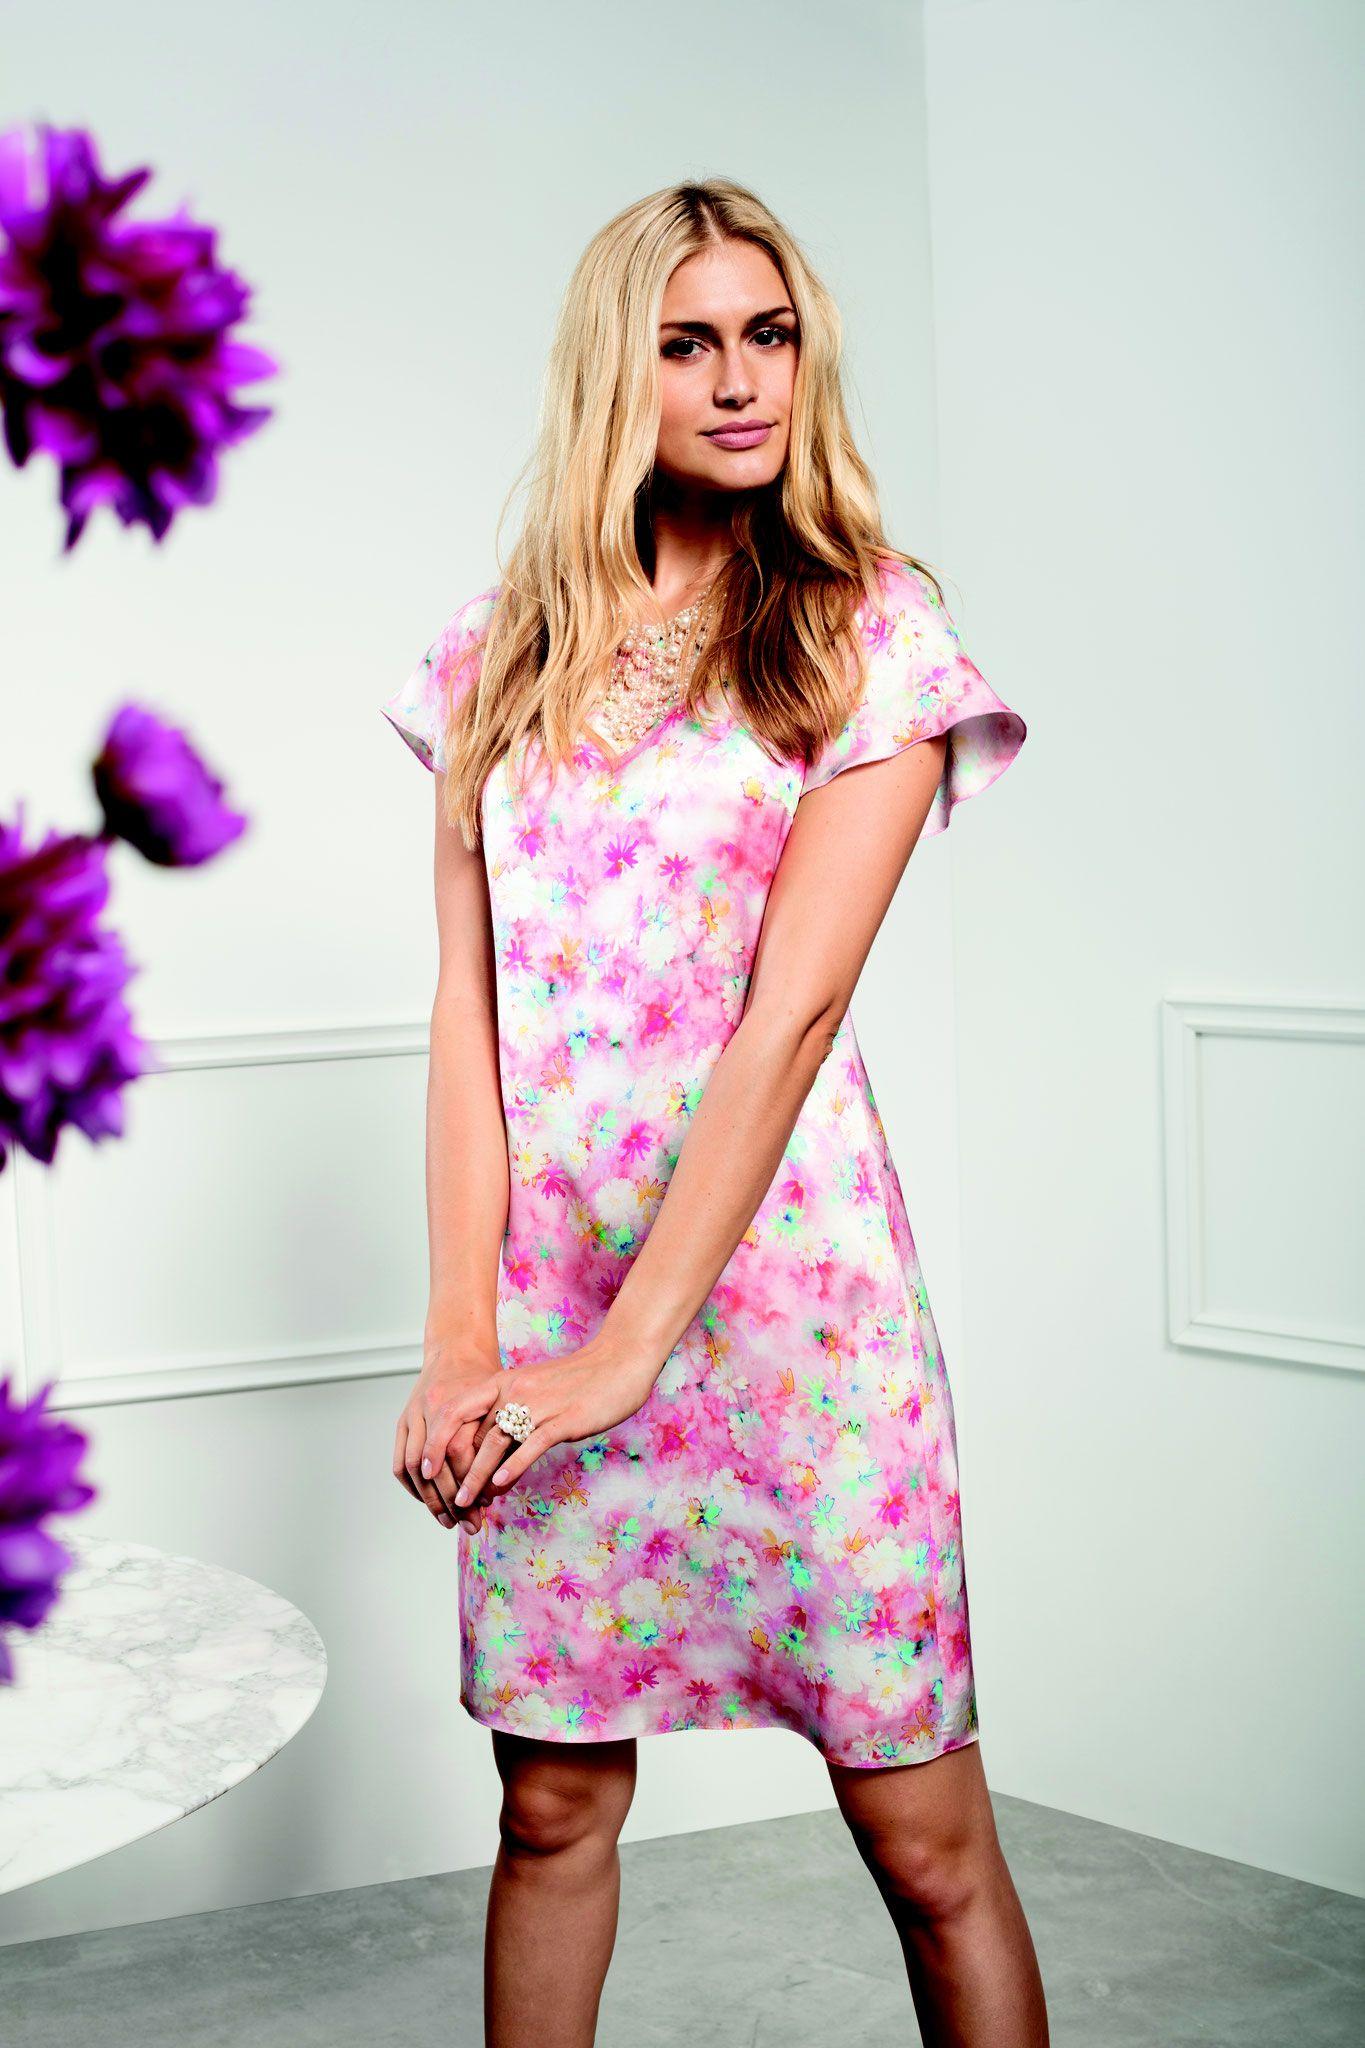 женская одежда больших размеров бренда Eugen Klein